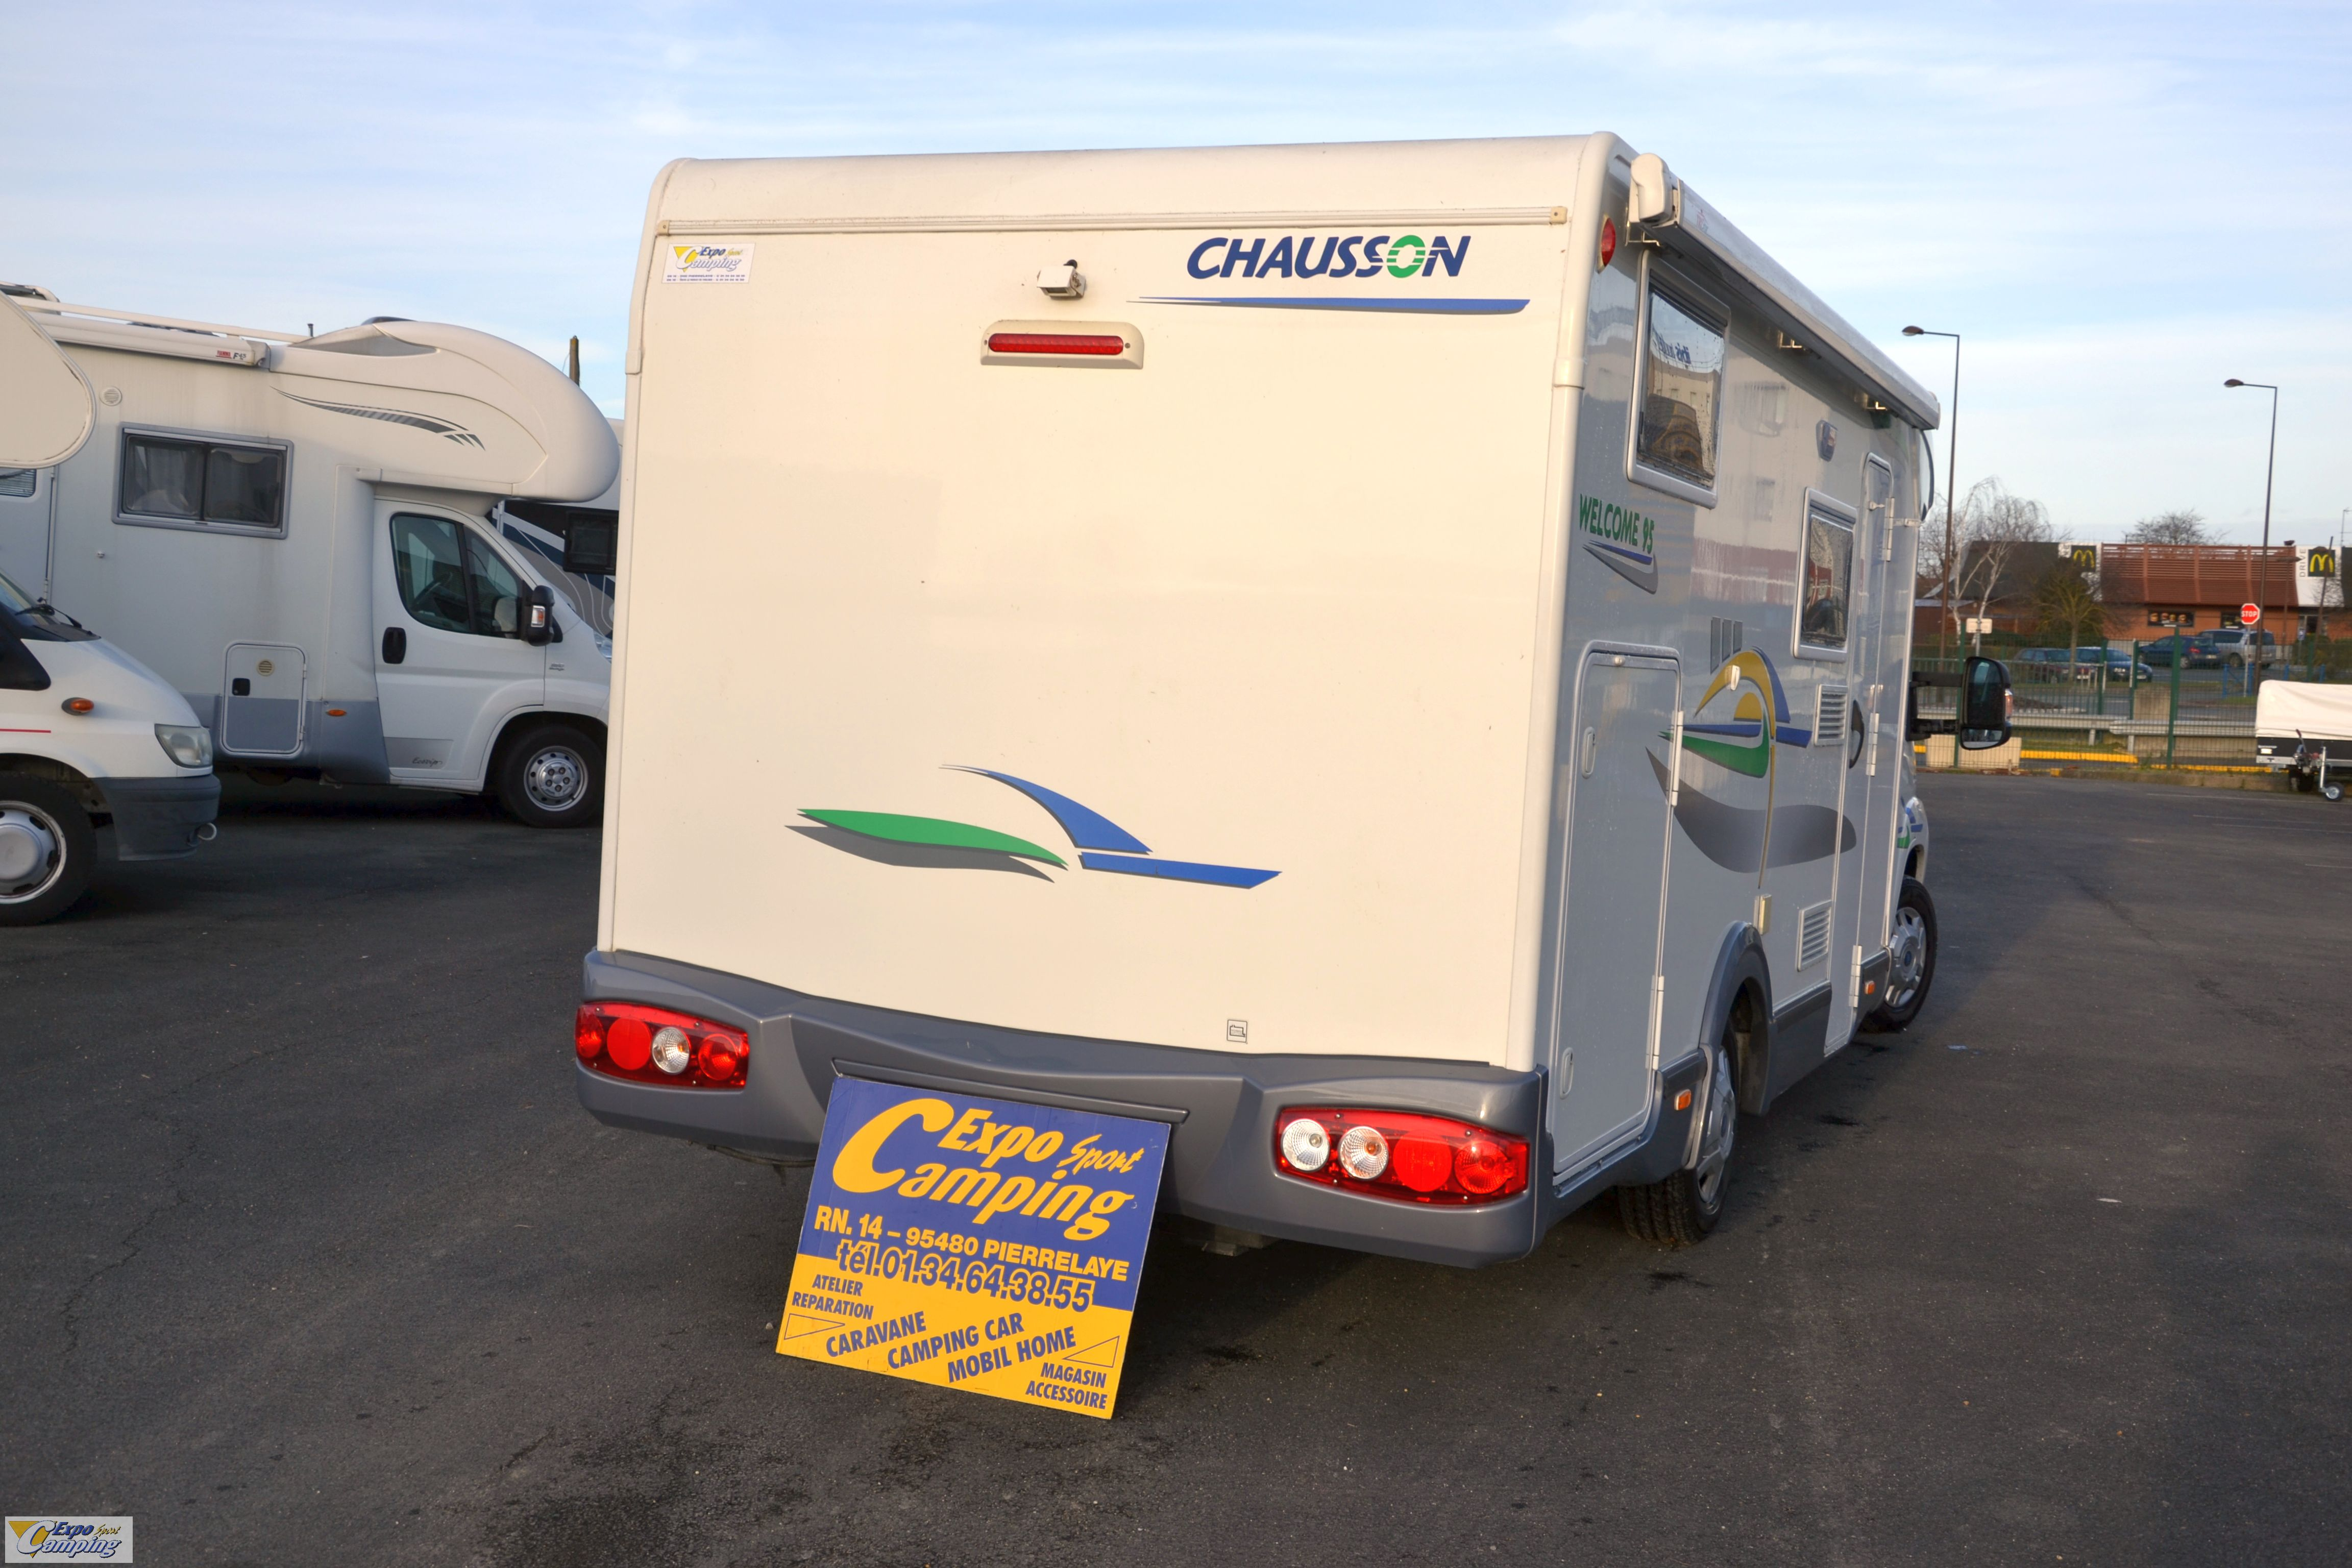 chausson welcome 95 occasion de 2007 fiat camping car en vente pierrelaye val d oise 95. Black Bedroom Furniture Sets. Home Design Ideas